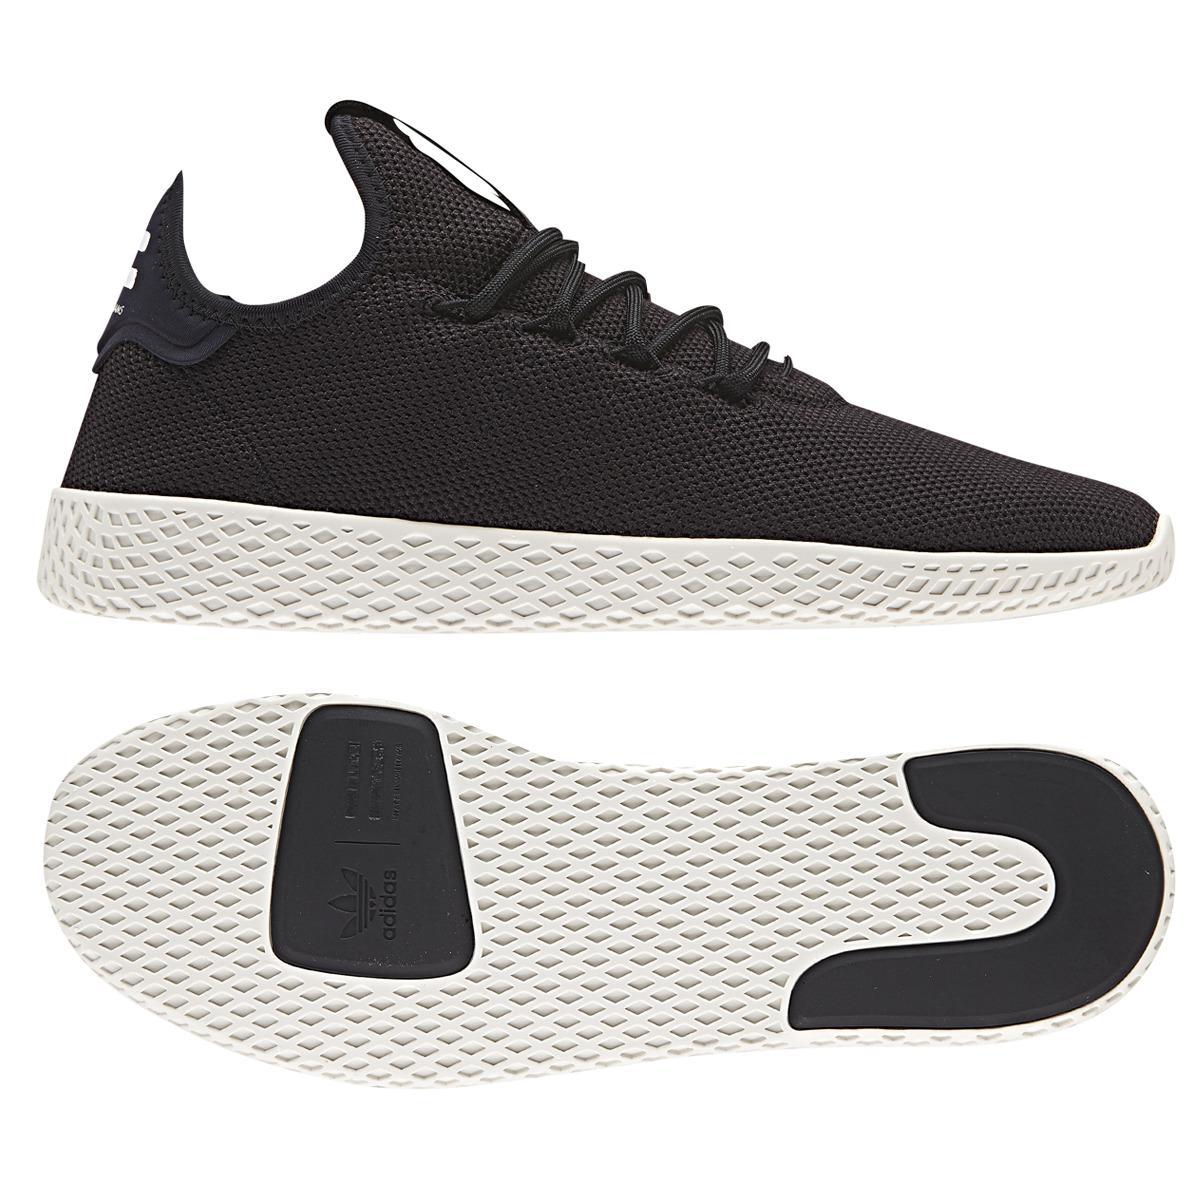 375841fecf6 Adidas Originals - Black Pw Tennis Hu Casual Trainers for Men - Lyst. View  fullscreen